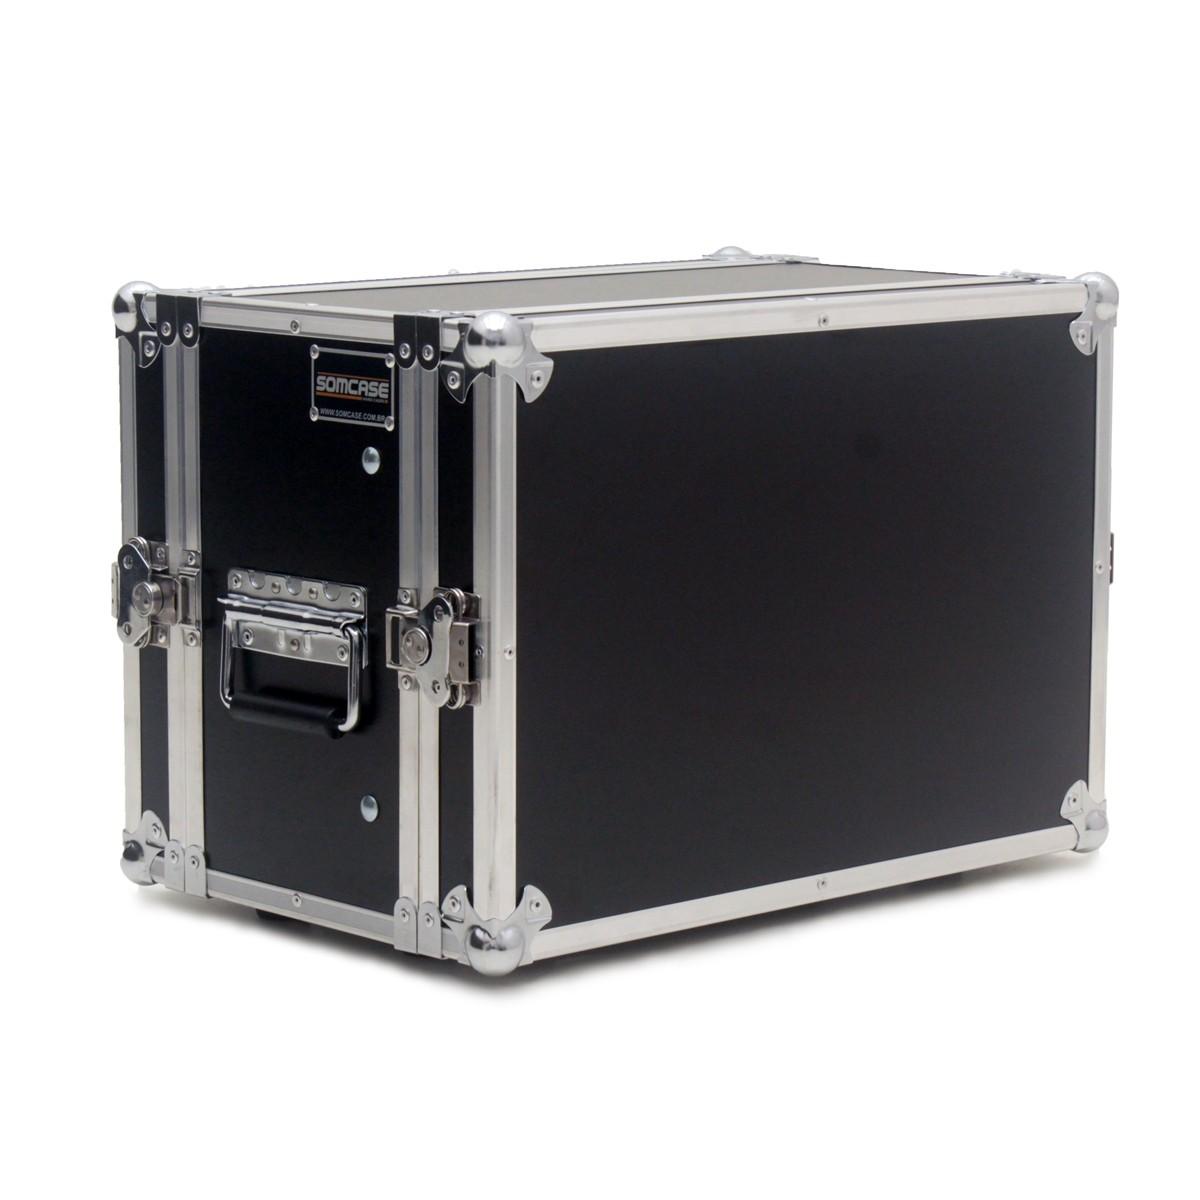 Hard Case Rack Mesa Soundcraft Mixer Ui24r + 3U